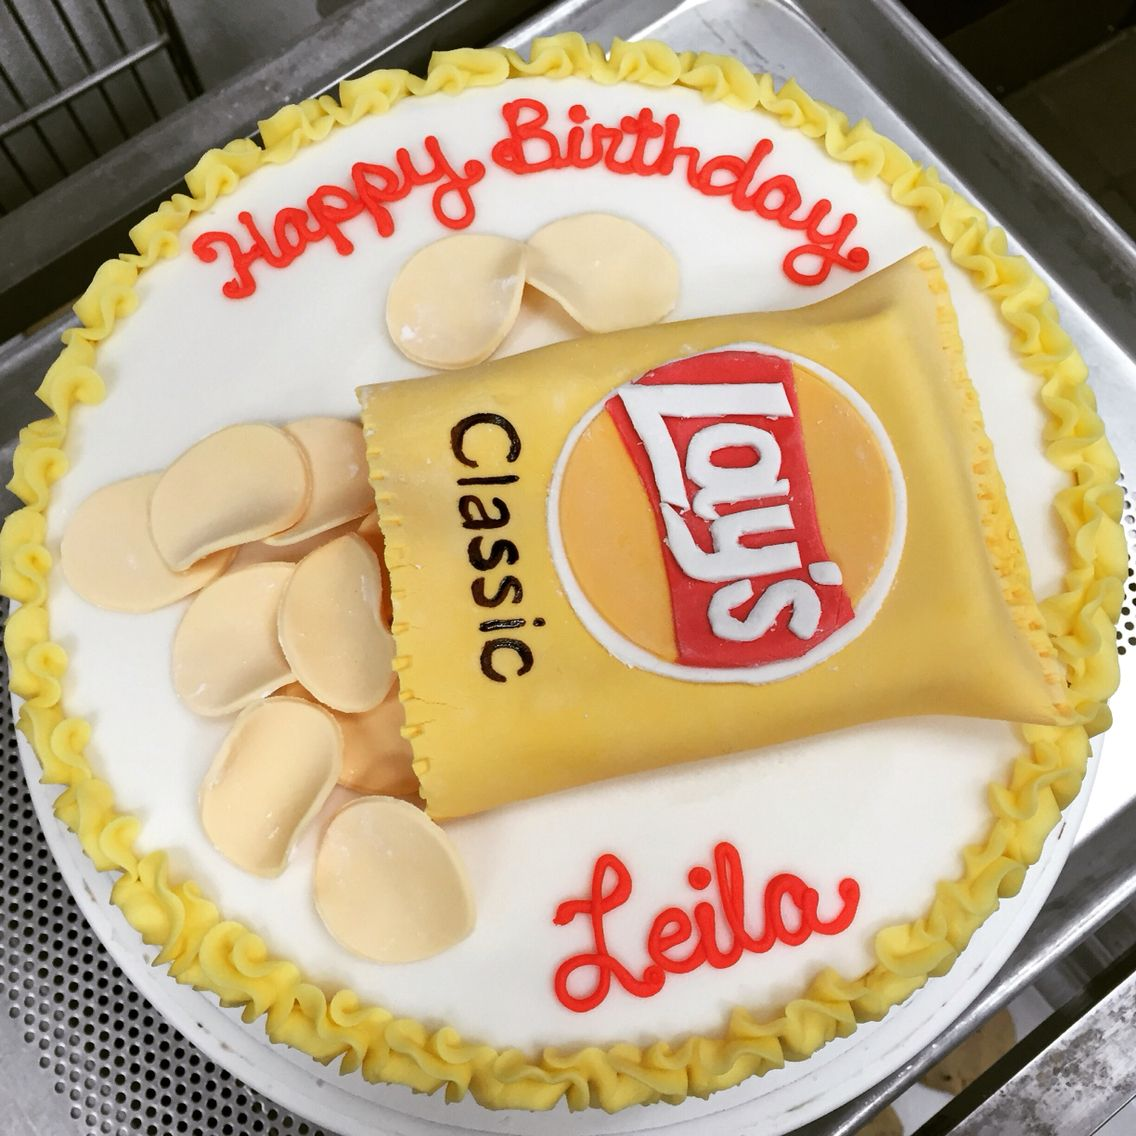 Swell Potato Chip Birthday Cake Custom Birthday Cakes Personalised Birthday Cards Paralily Jamesorg